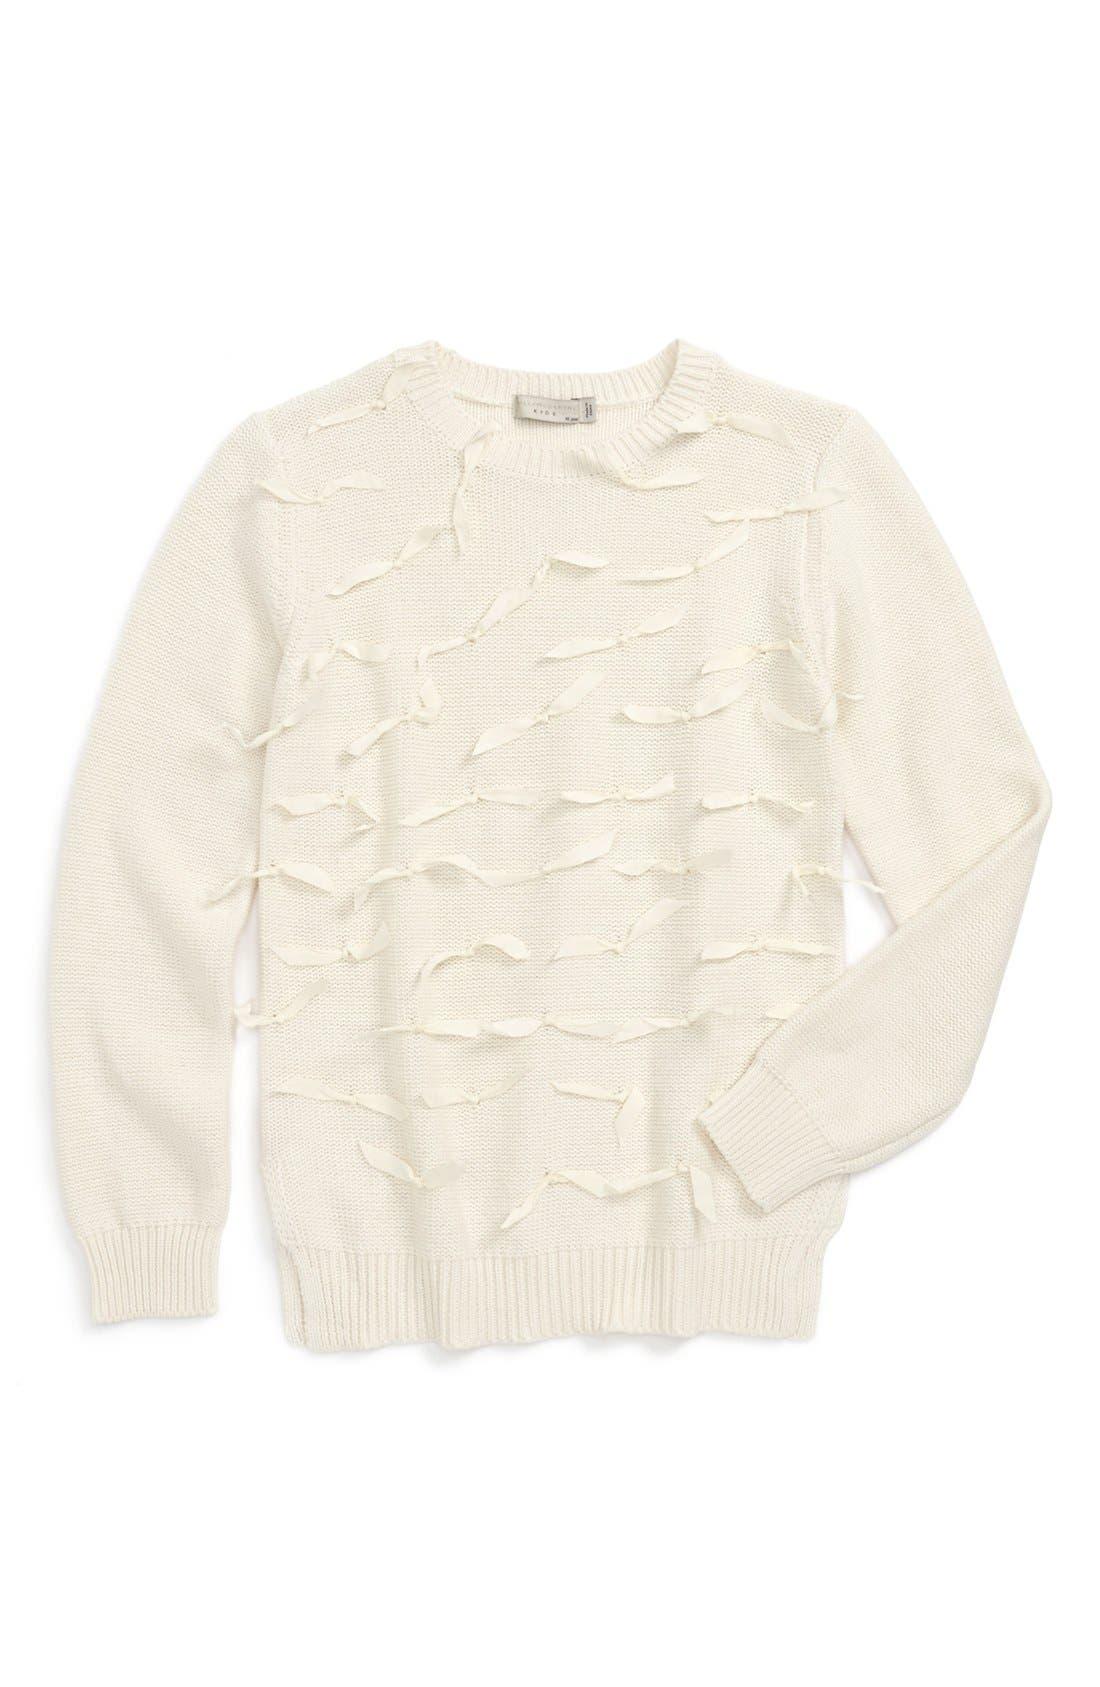 Alternate Image 1 Selected - Stella McCartney Kids 'Emily' Sweater (Little Girls & Big Girls)